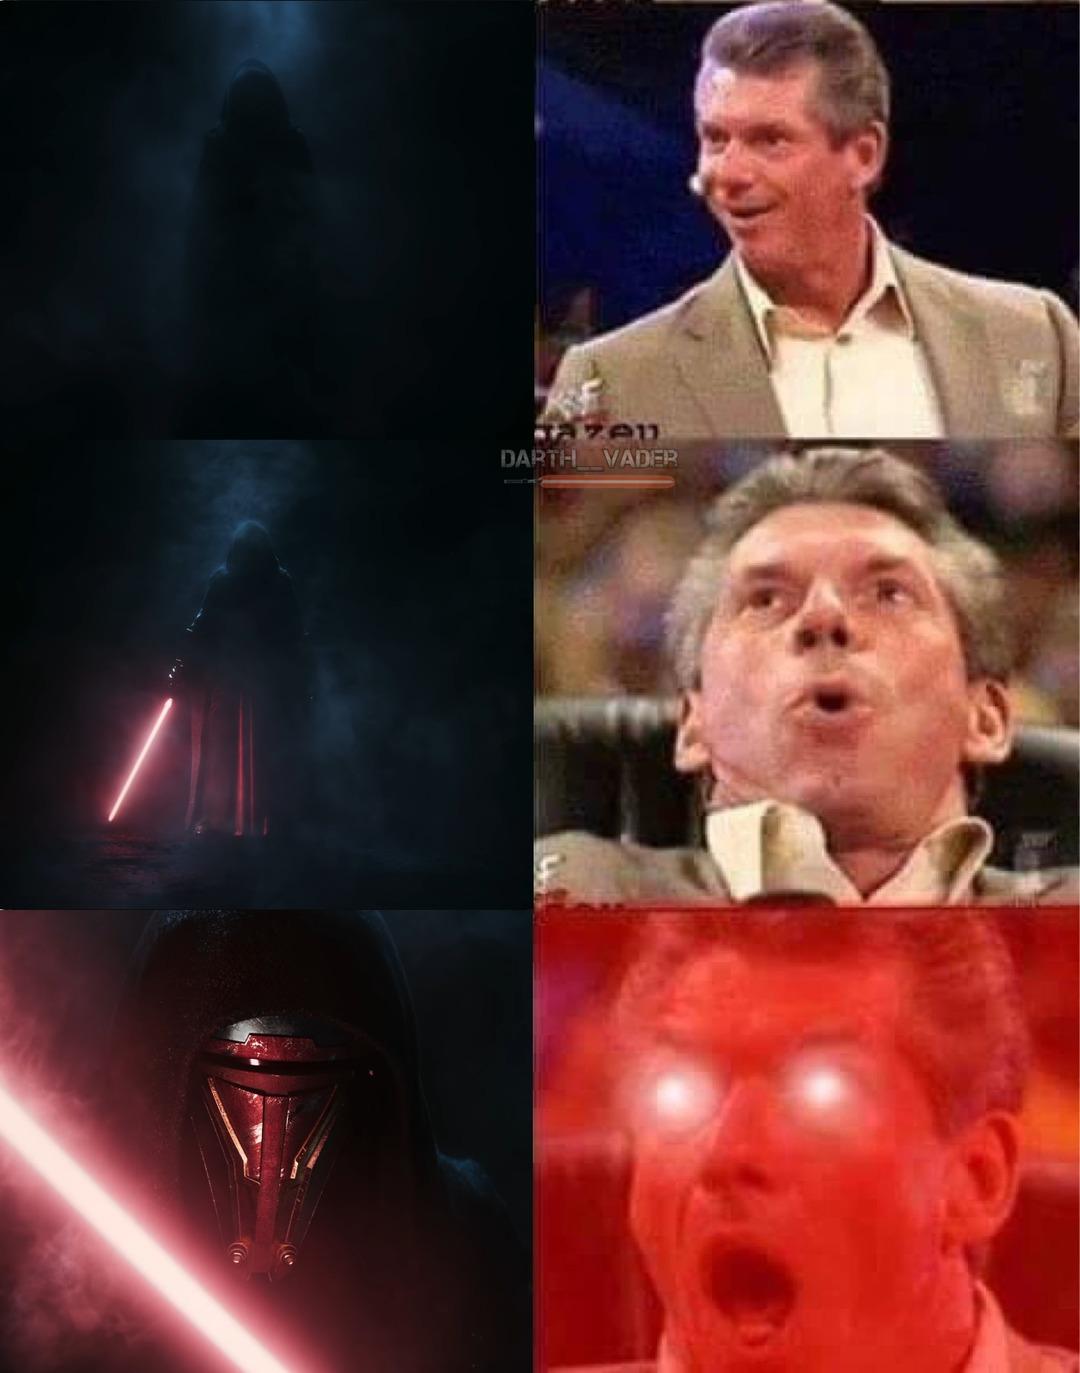 The remake is happening, boys - meme